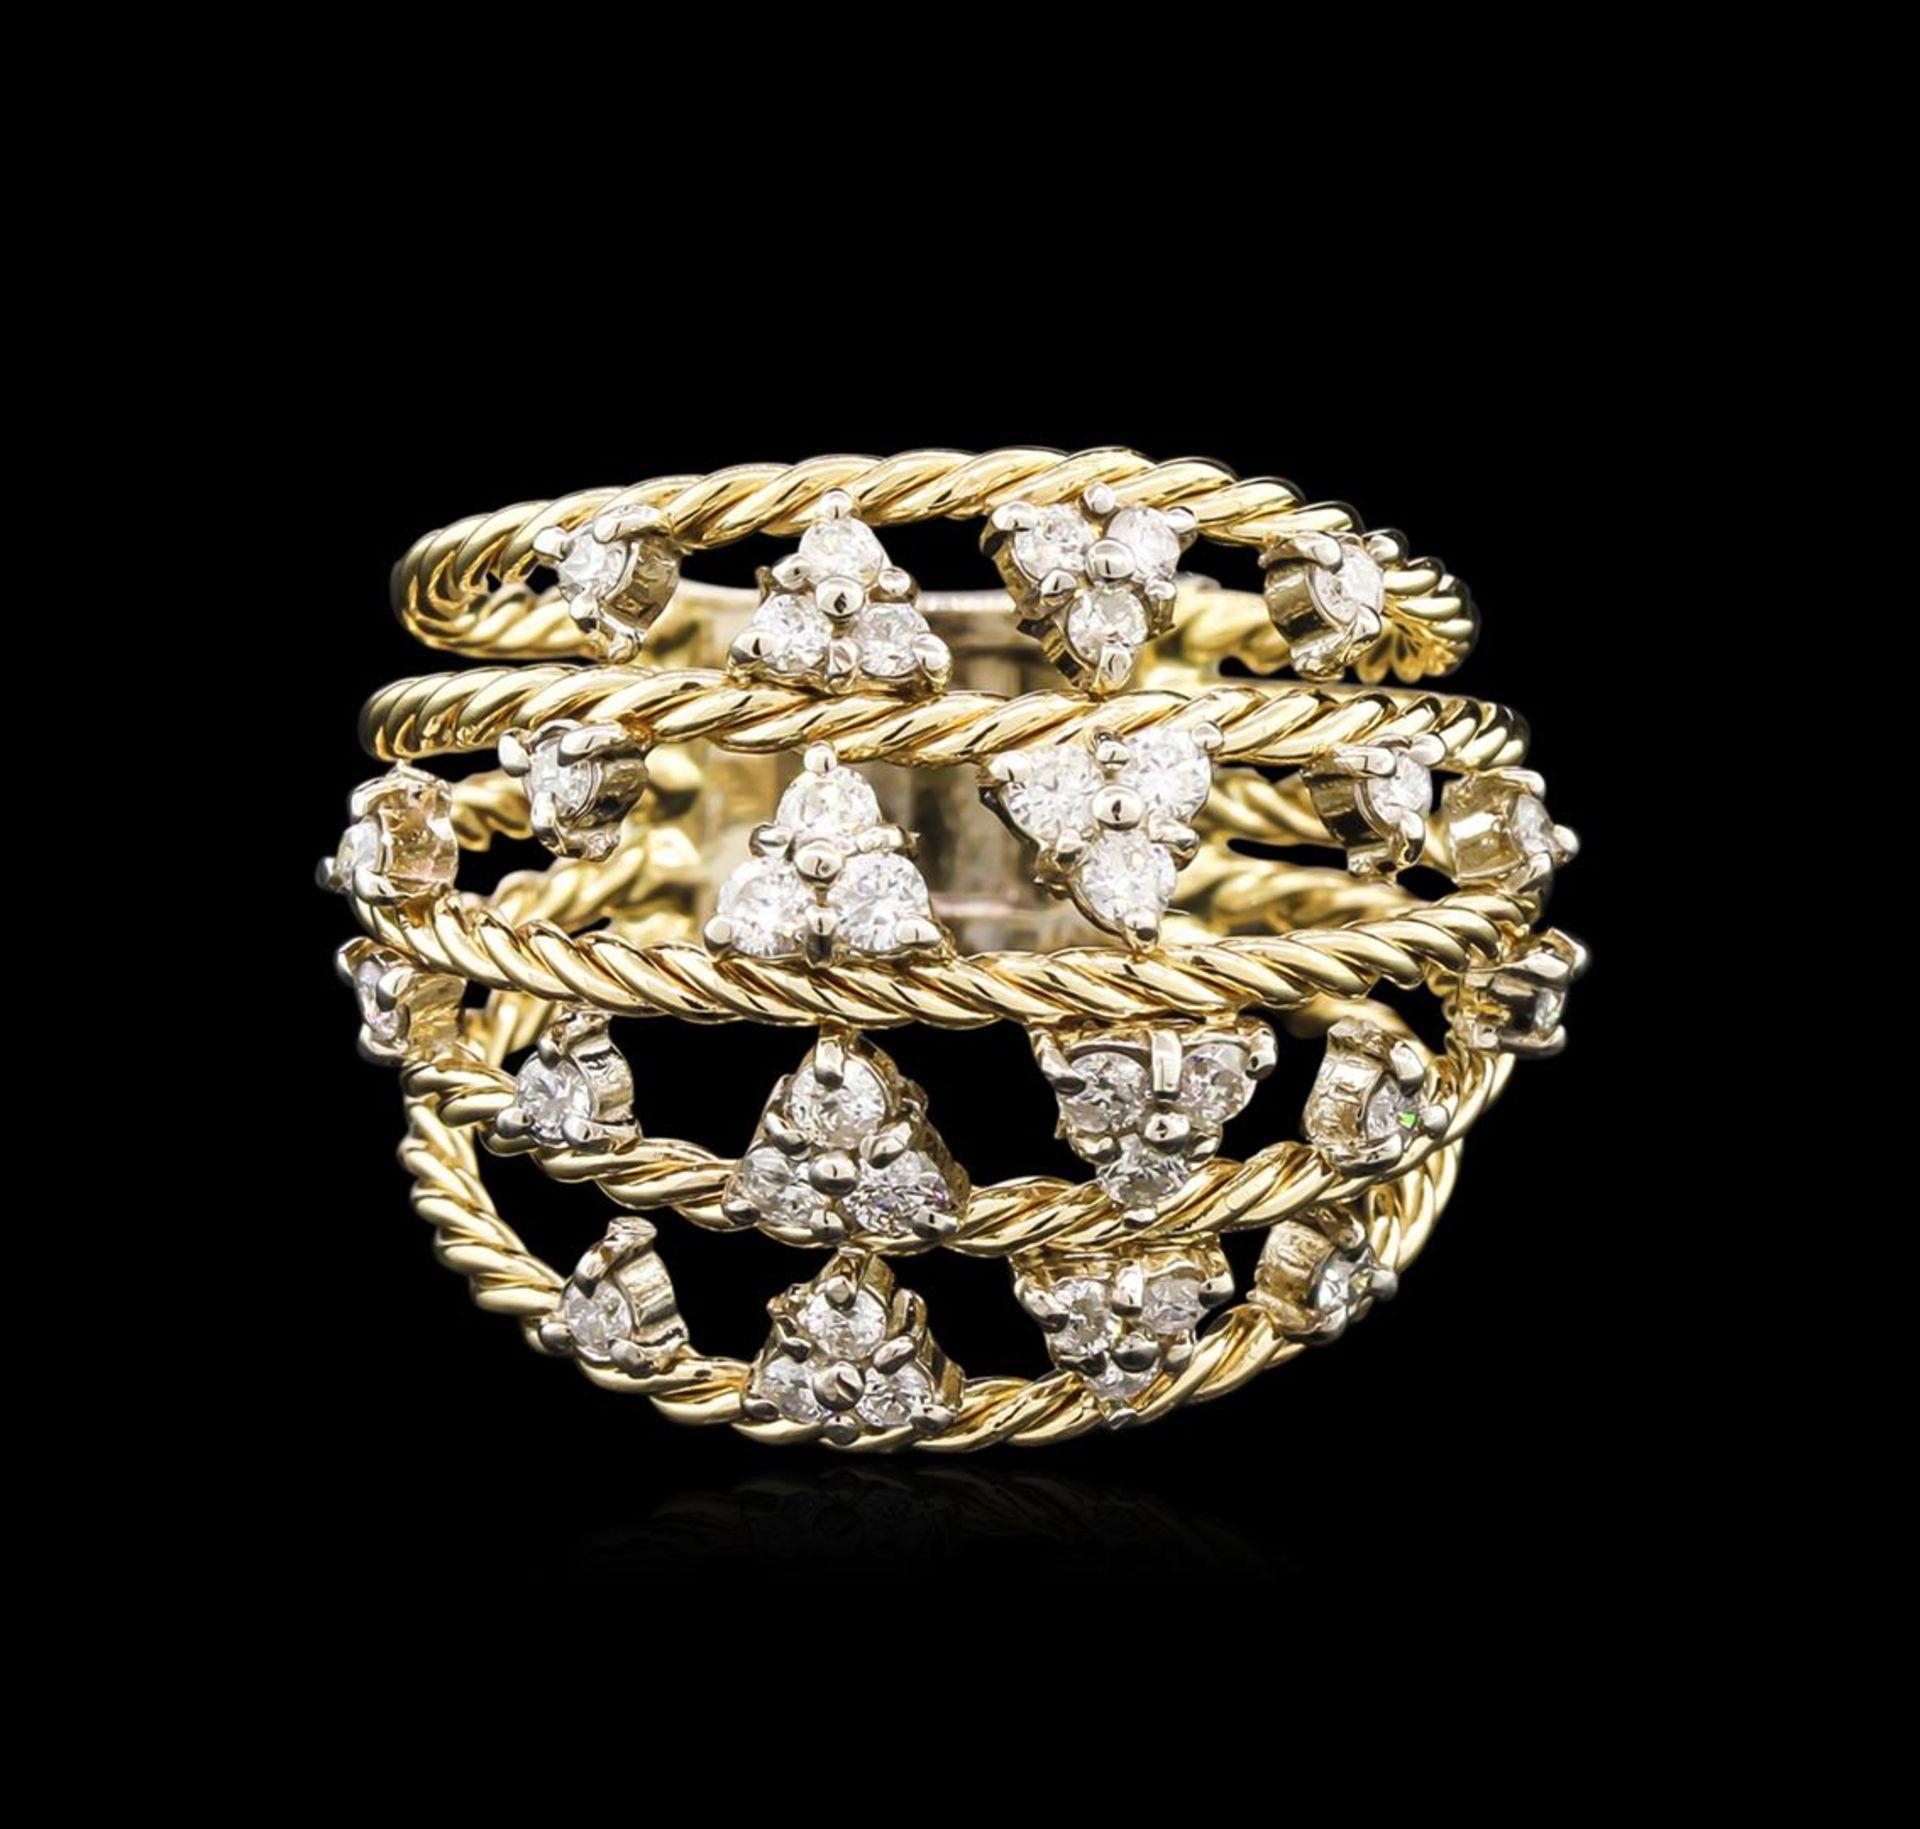 0.60 ctw Diamond Ring - 14KT Yellow Gold - Image 2 of 2